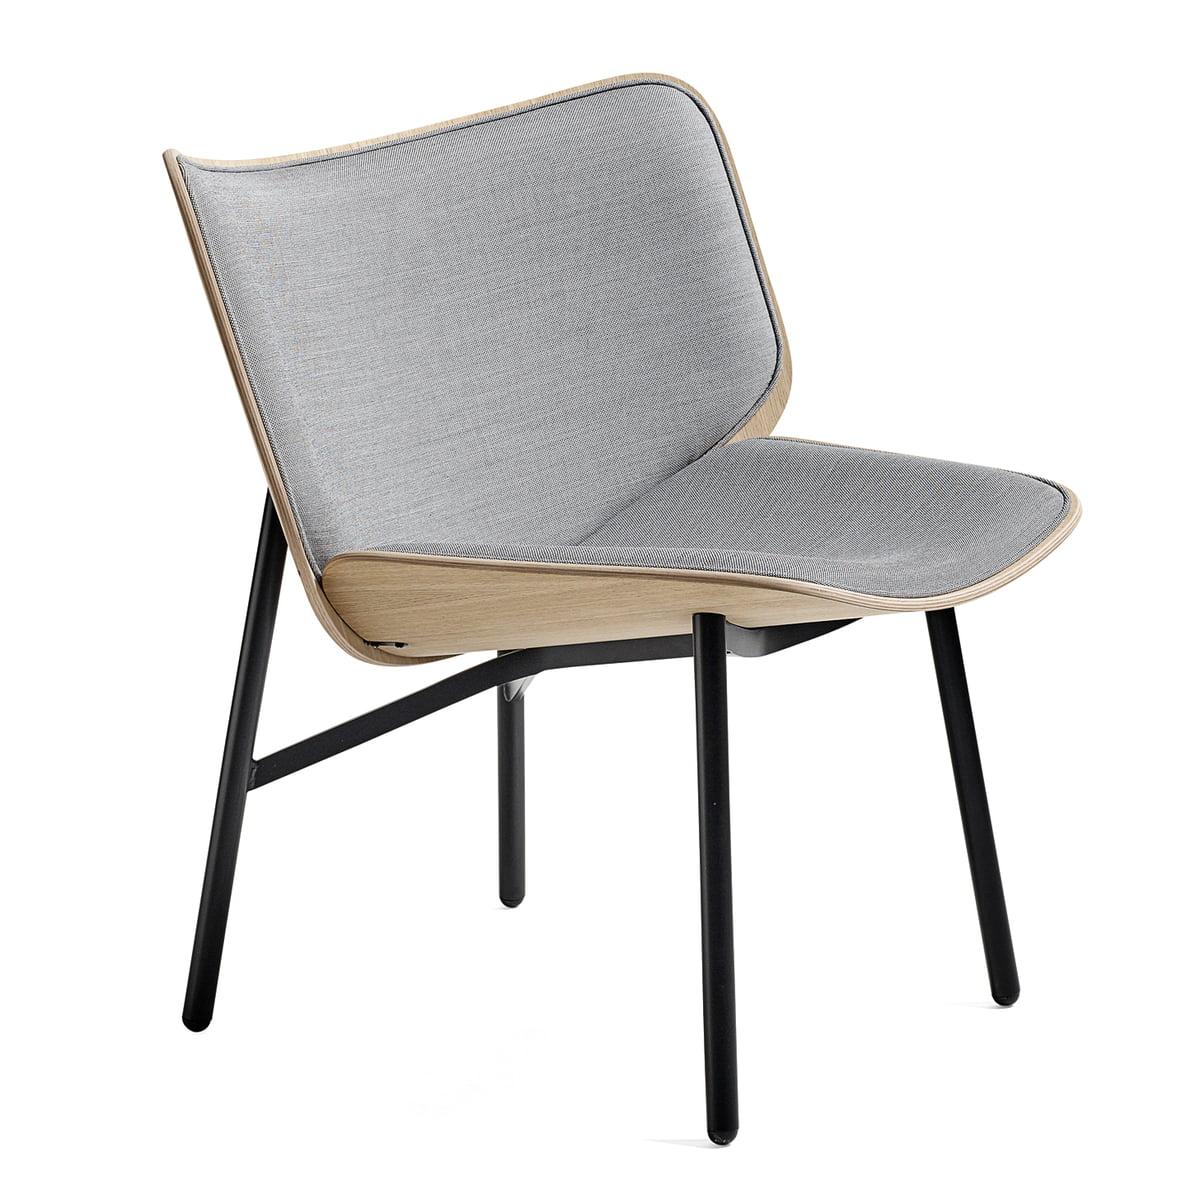 Hay - Dapper Lounge Chair, Eiche matt lackiert / schwarz / Surface 120 (EU) | Wohnzimmer > Sessel > Loungesessel | Grau | Hay